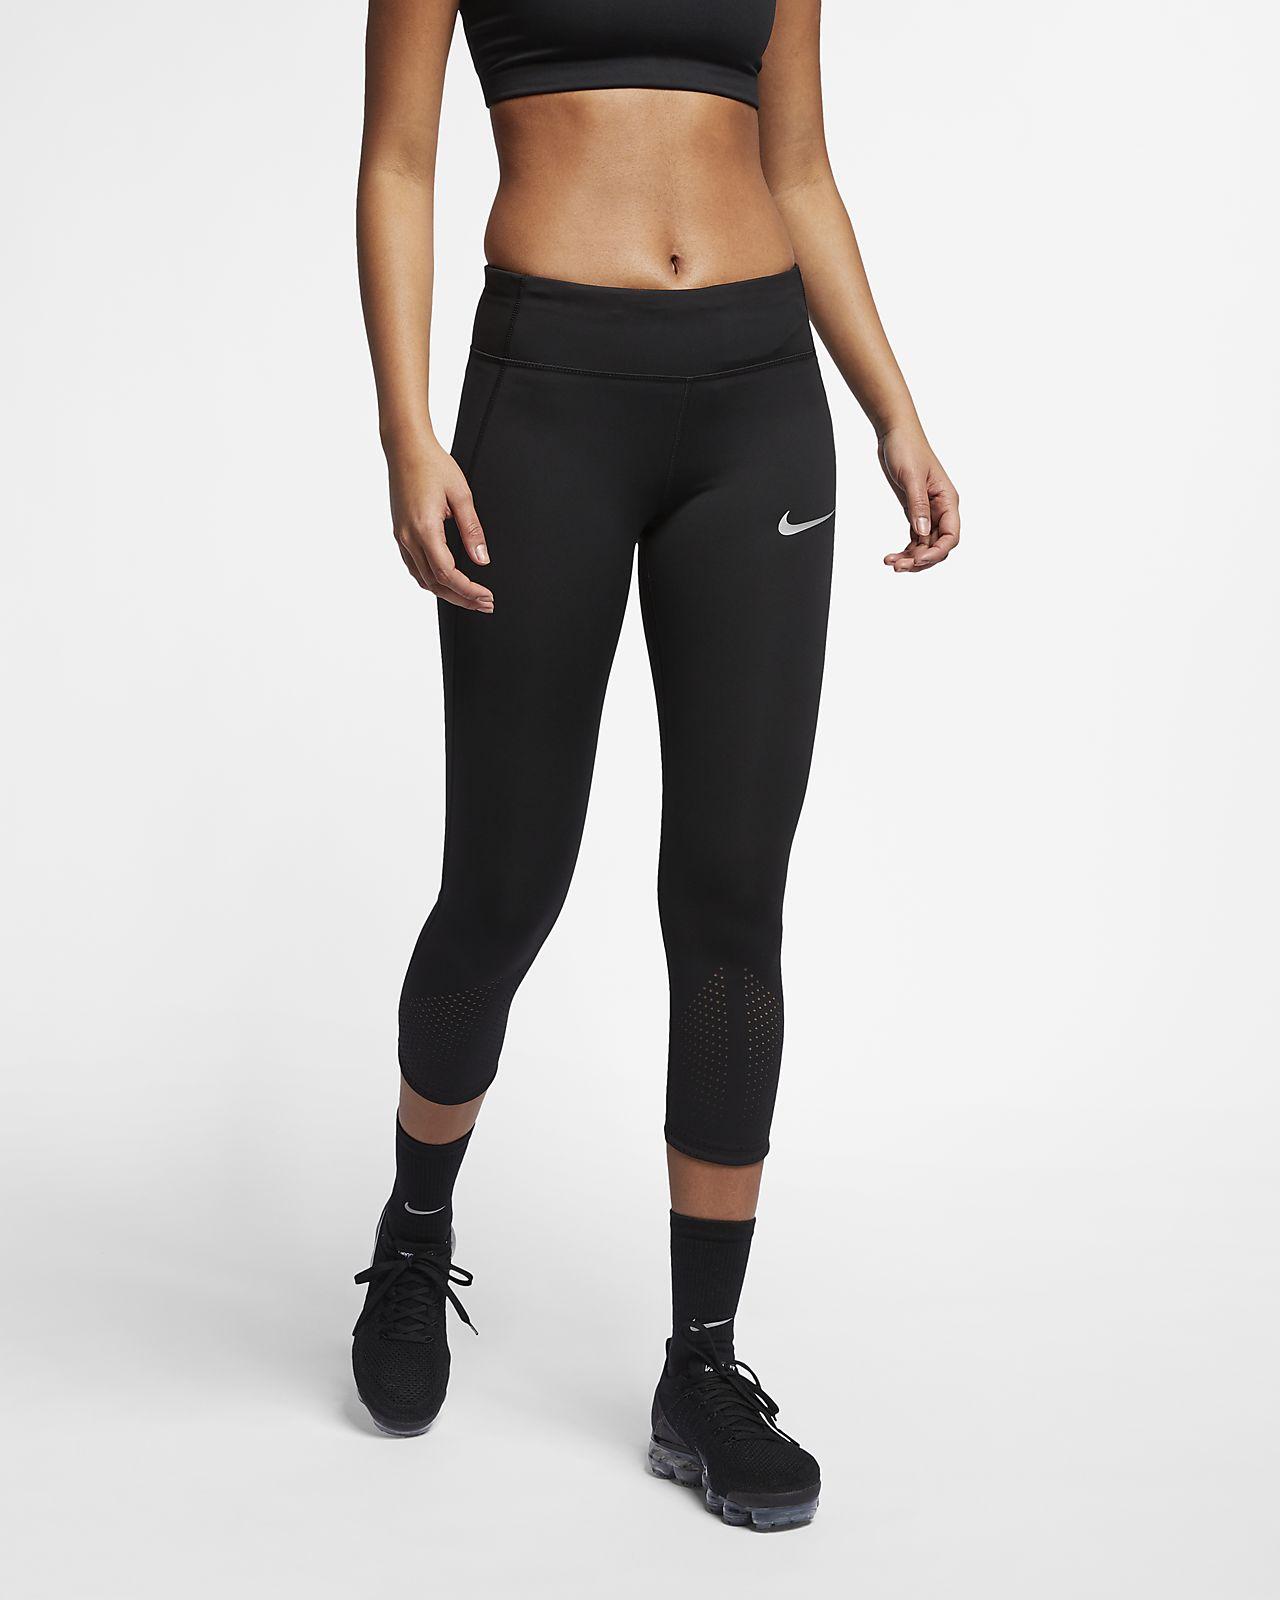 Nike Epic Lux 3/4-hardloopbroek voor dames